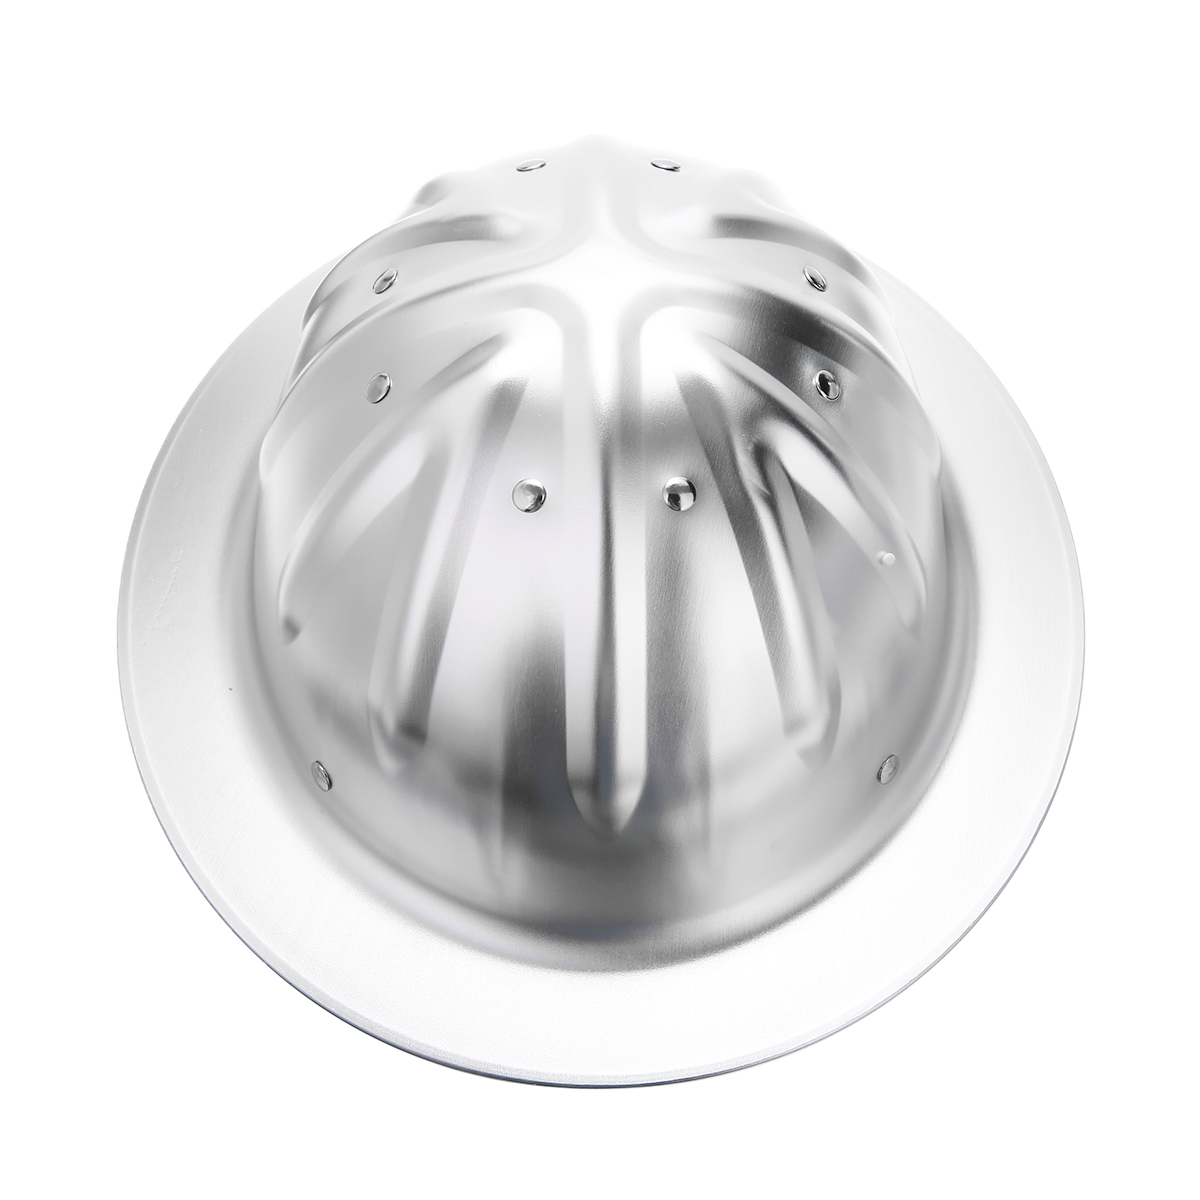 1pc Silver Full Brim Construction Safety Helmet High Hardness Aluminum Hard Hat Protection For Railway Metallurgy Coal Mine